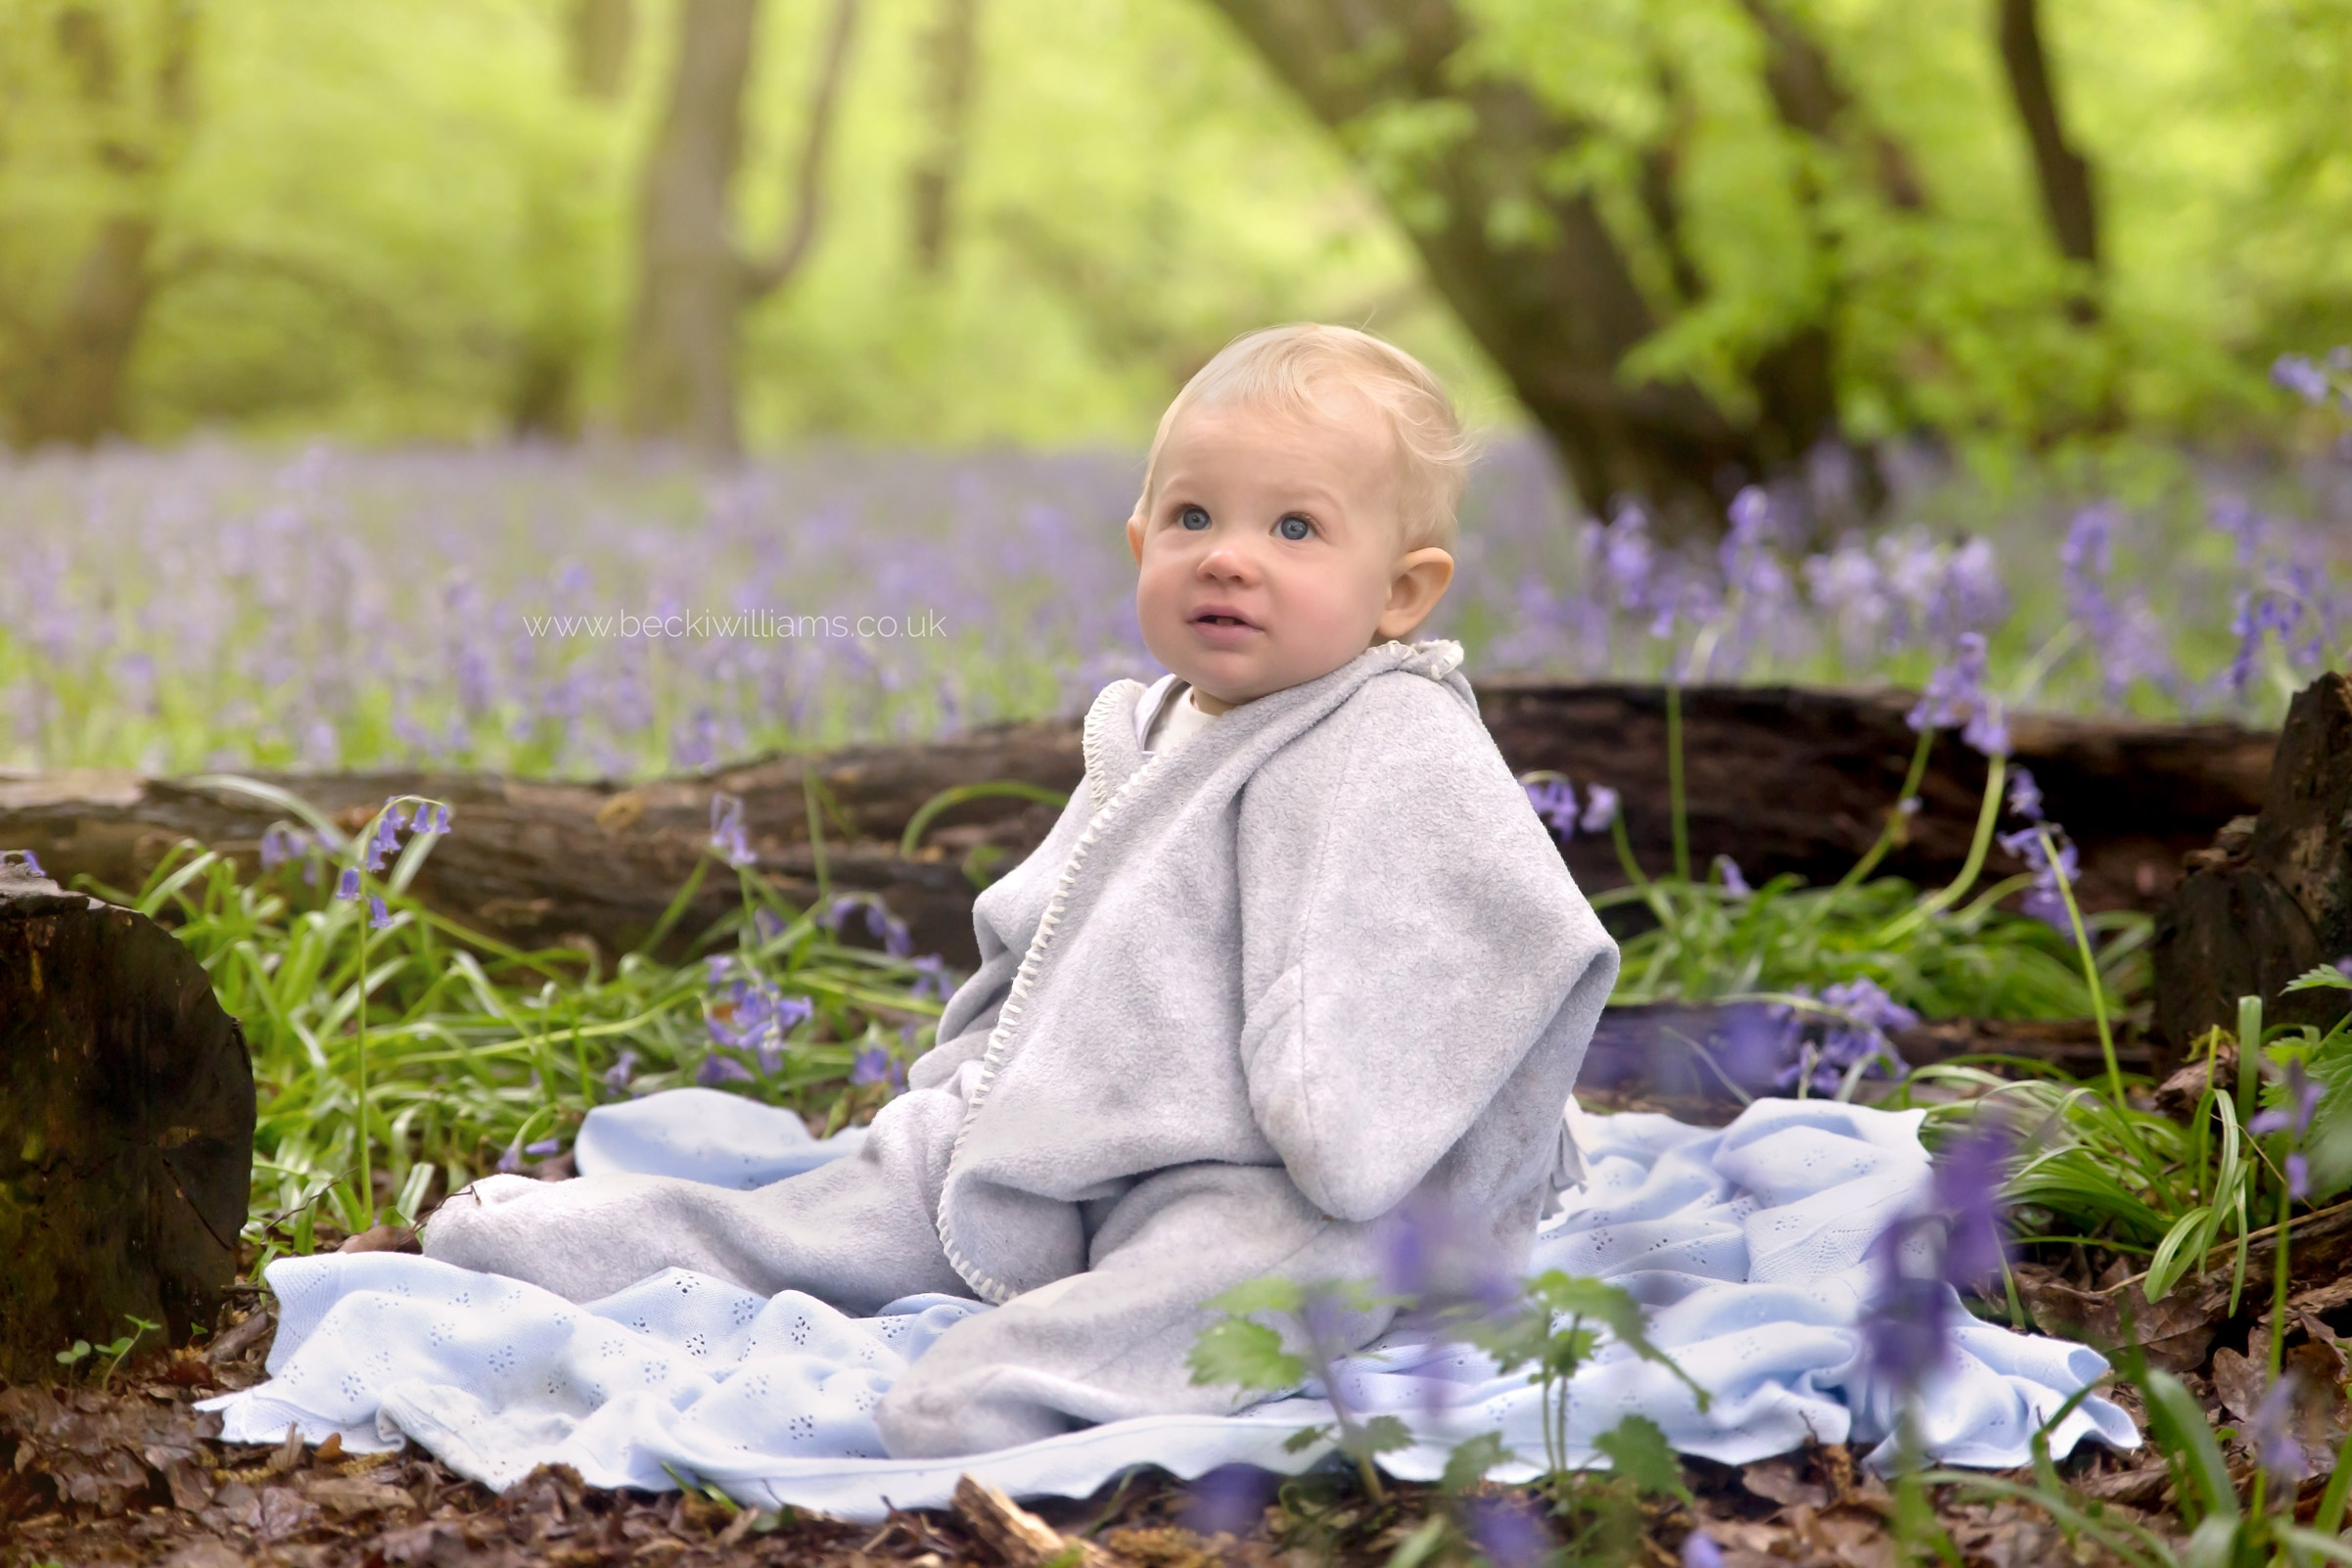 bluebells-st-albans-becki-williams-photography-12.jpg